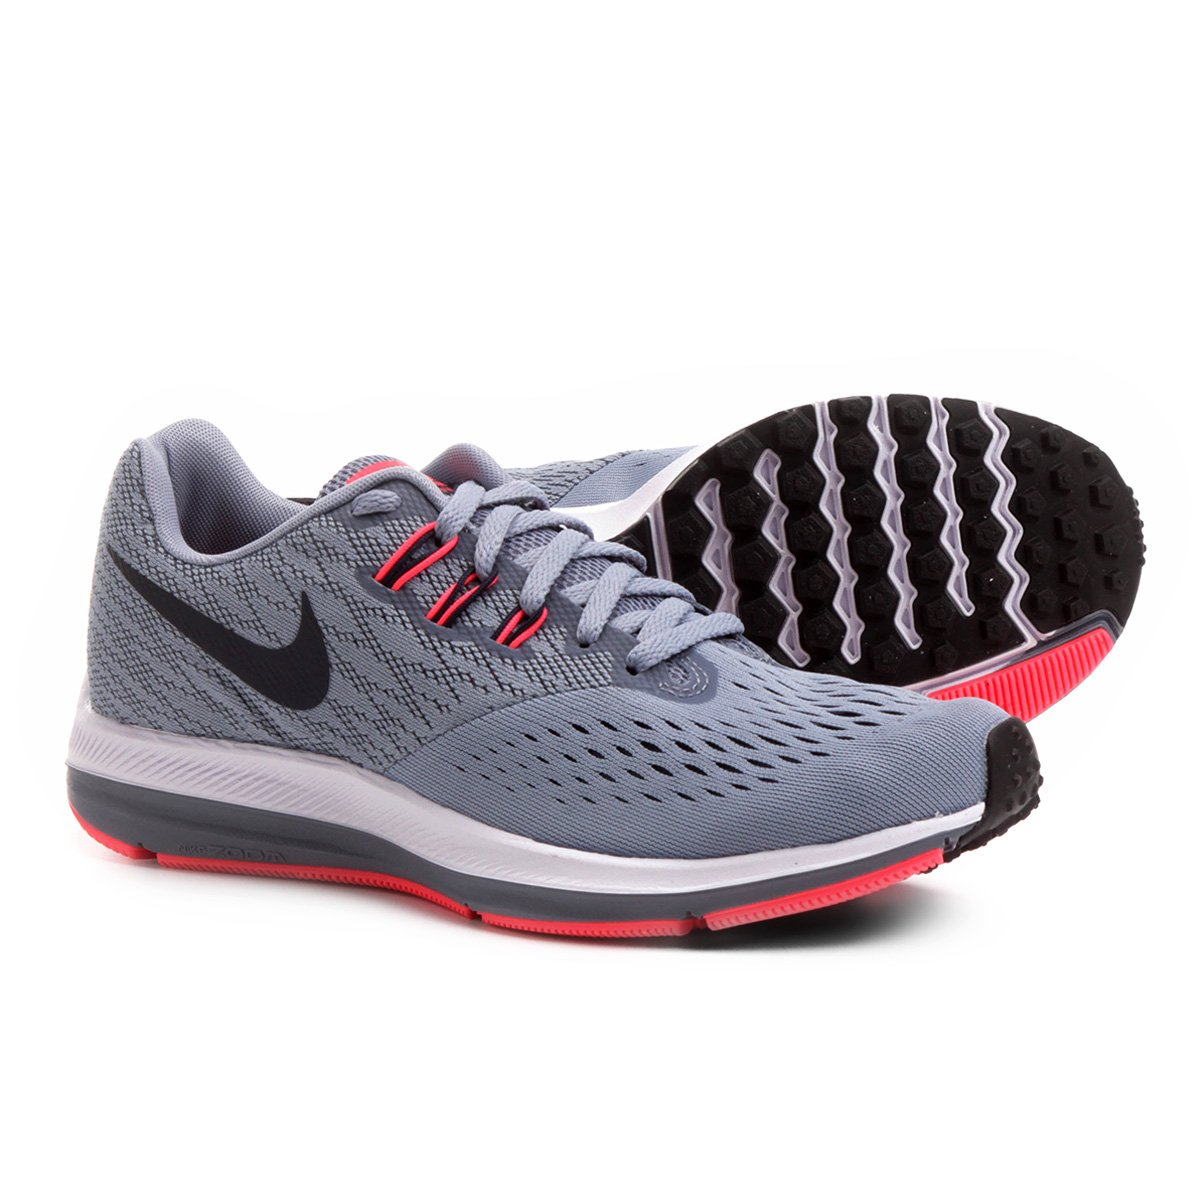 big sale 8cf7c b6e78 Tênis Nike Zoom Winflo 4 Feminino | Loja do Inter